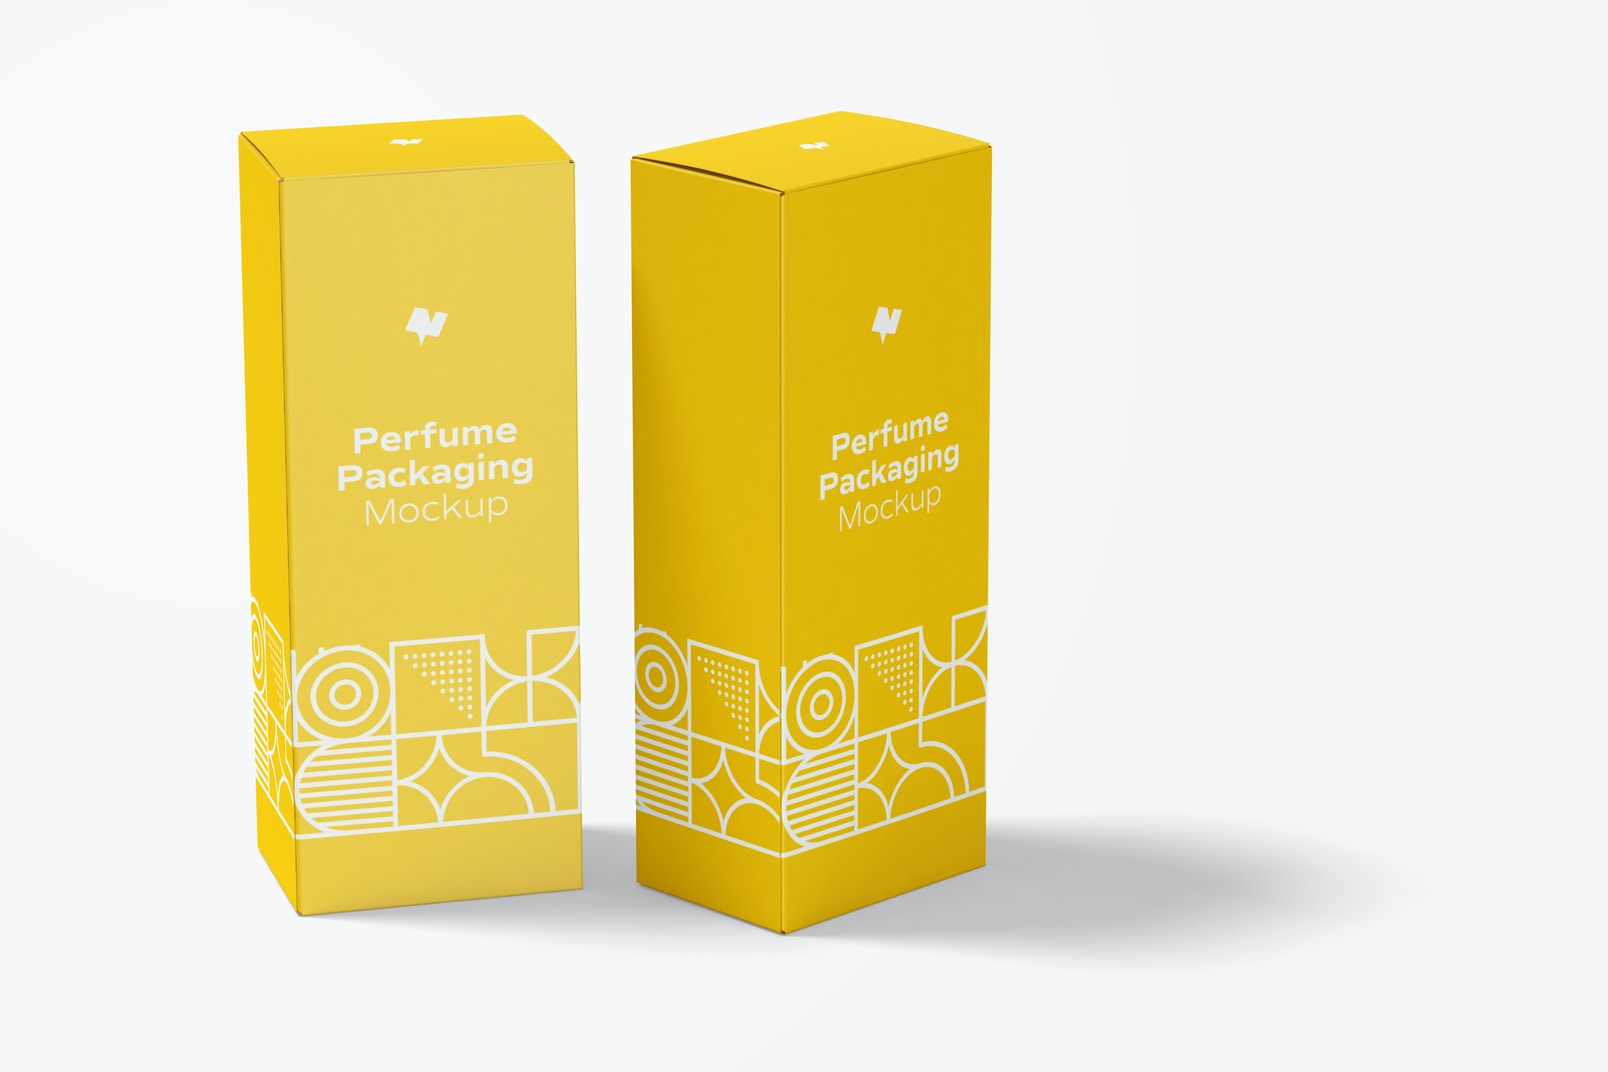 Large Perfume Packaging Mockup, Perspective